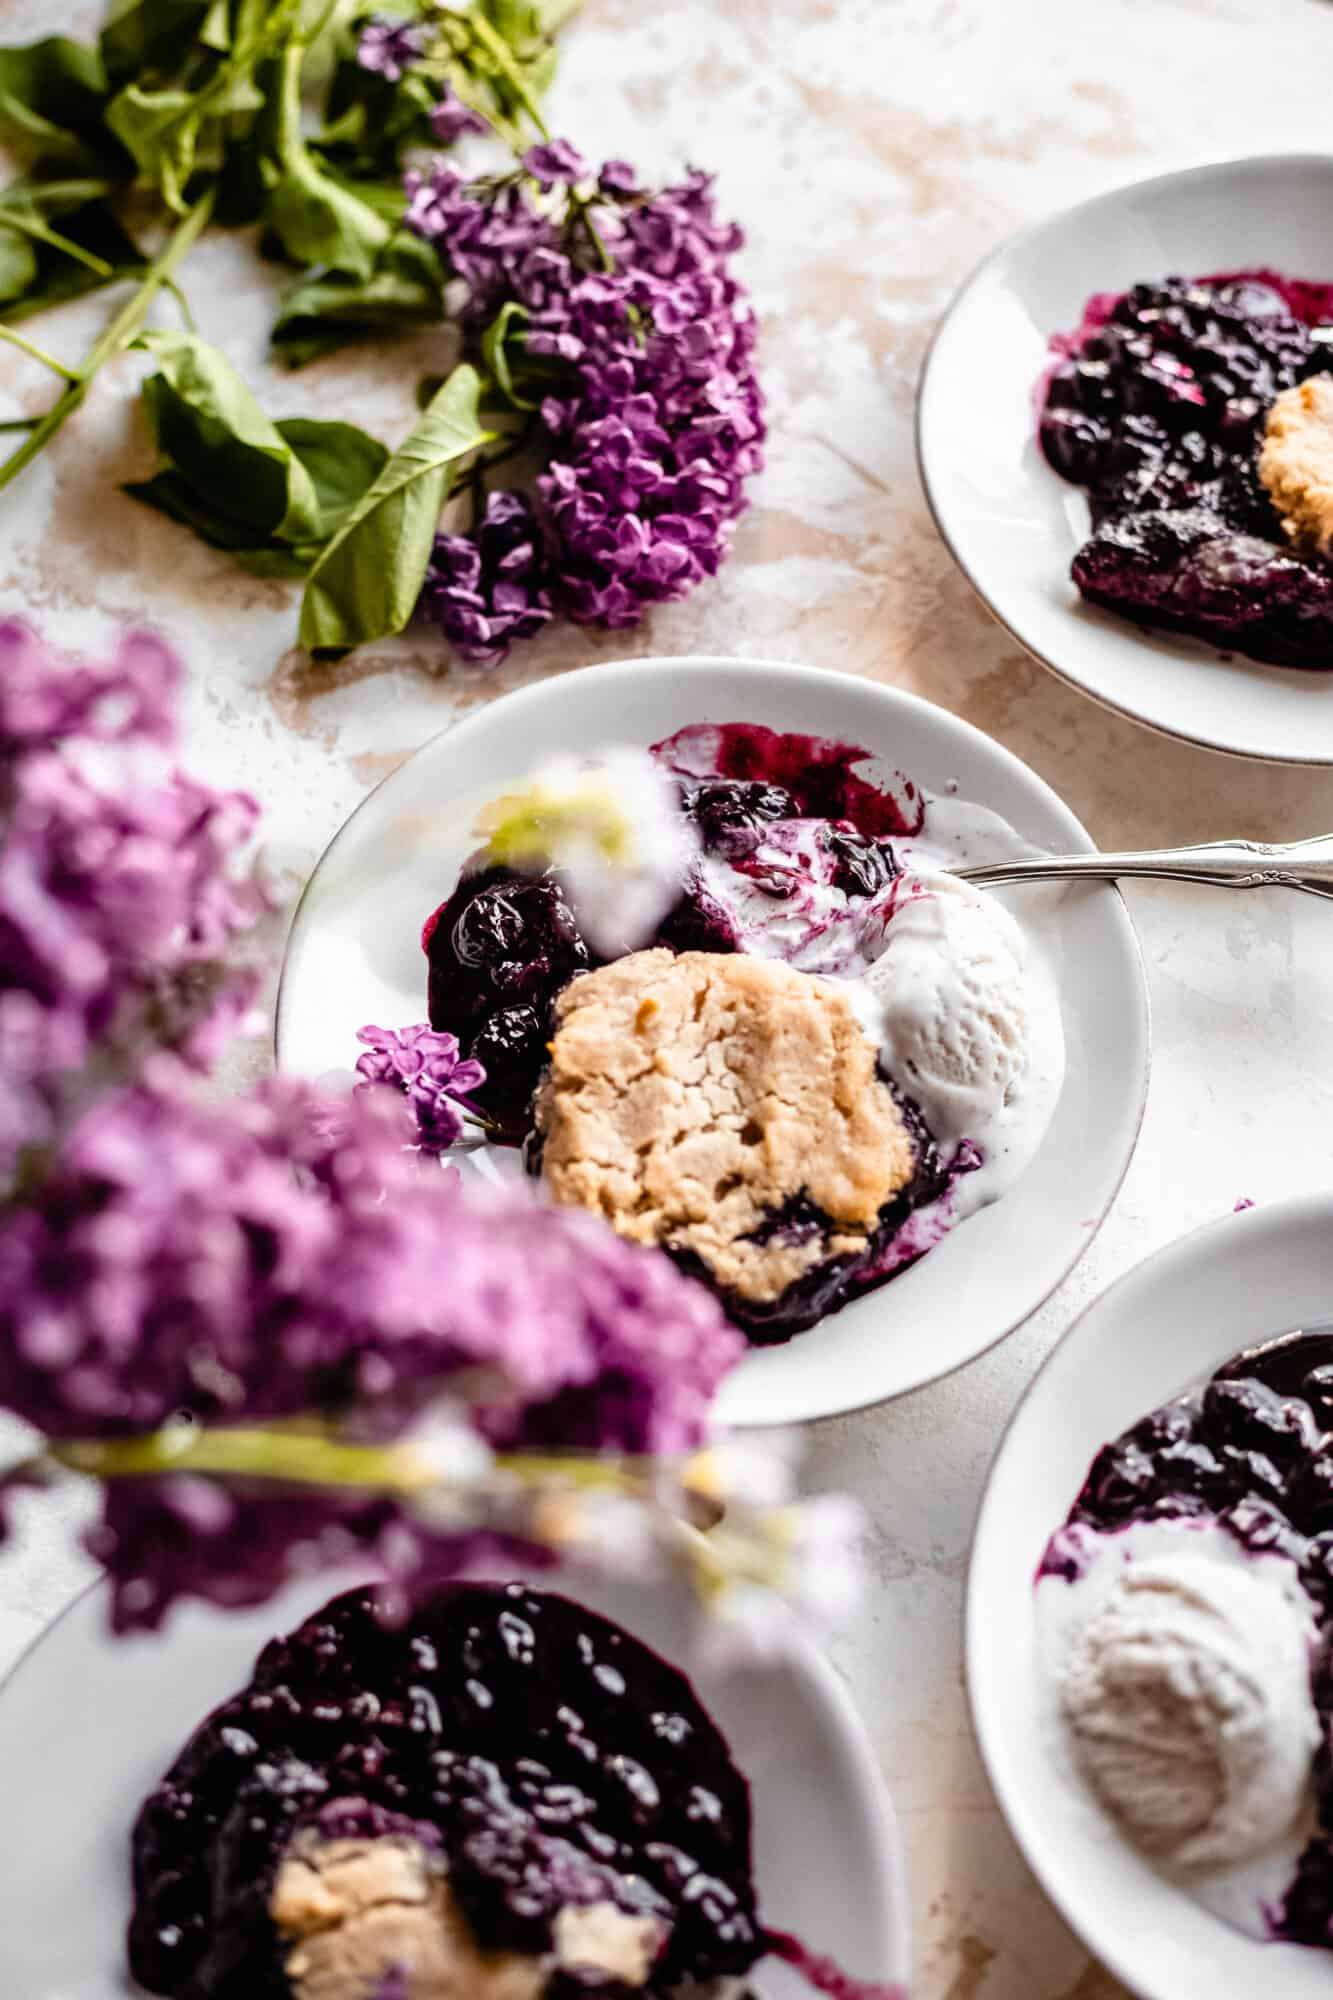 plates of blueberry cobbler